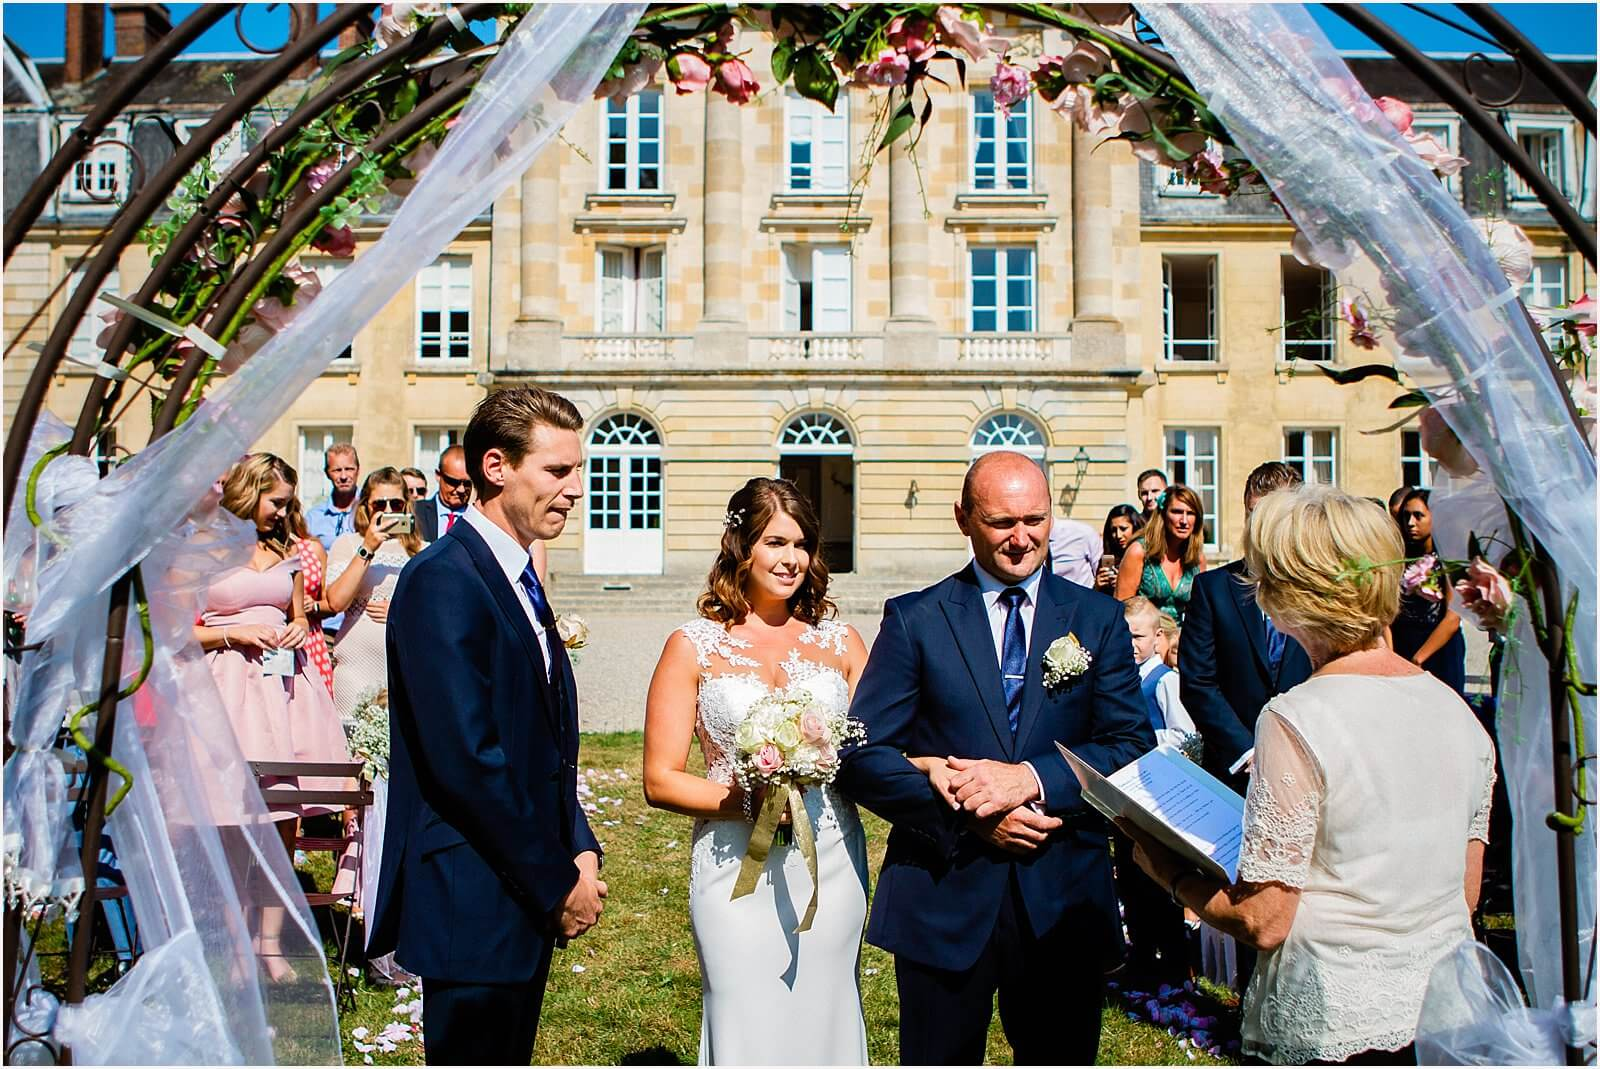 Chateau de Courtomer Wedding | Chantel & Evan 27